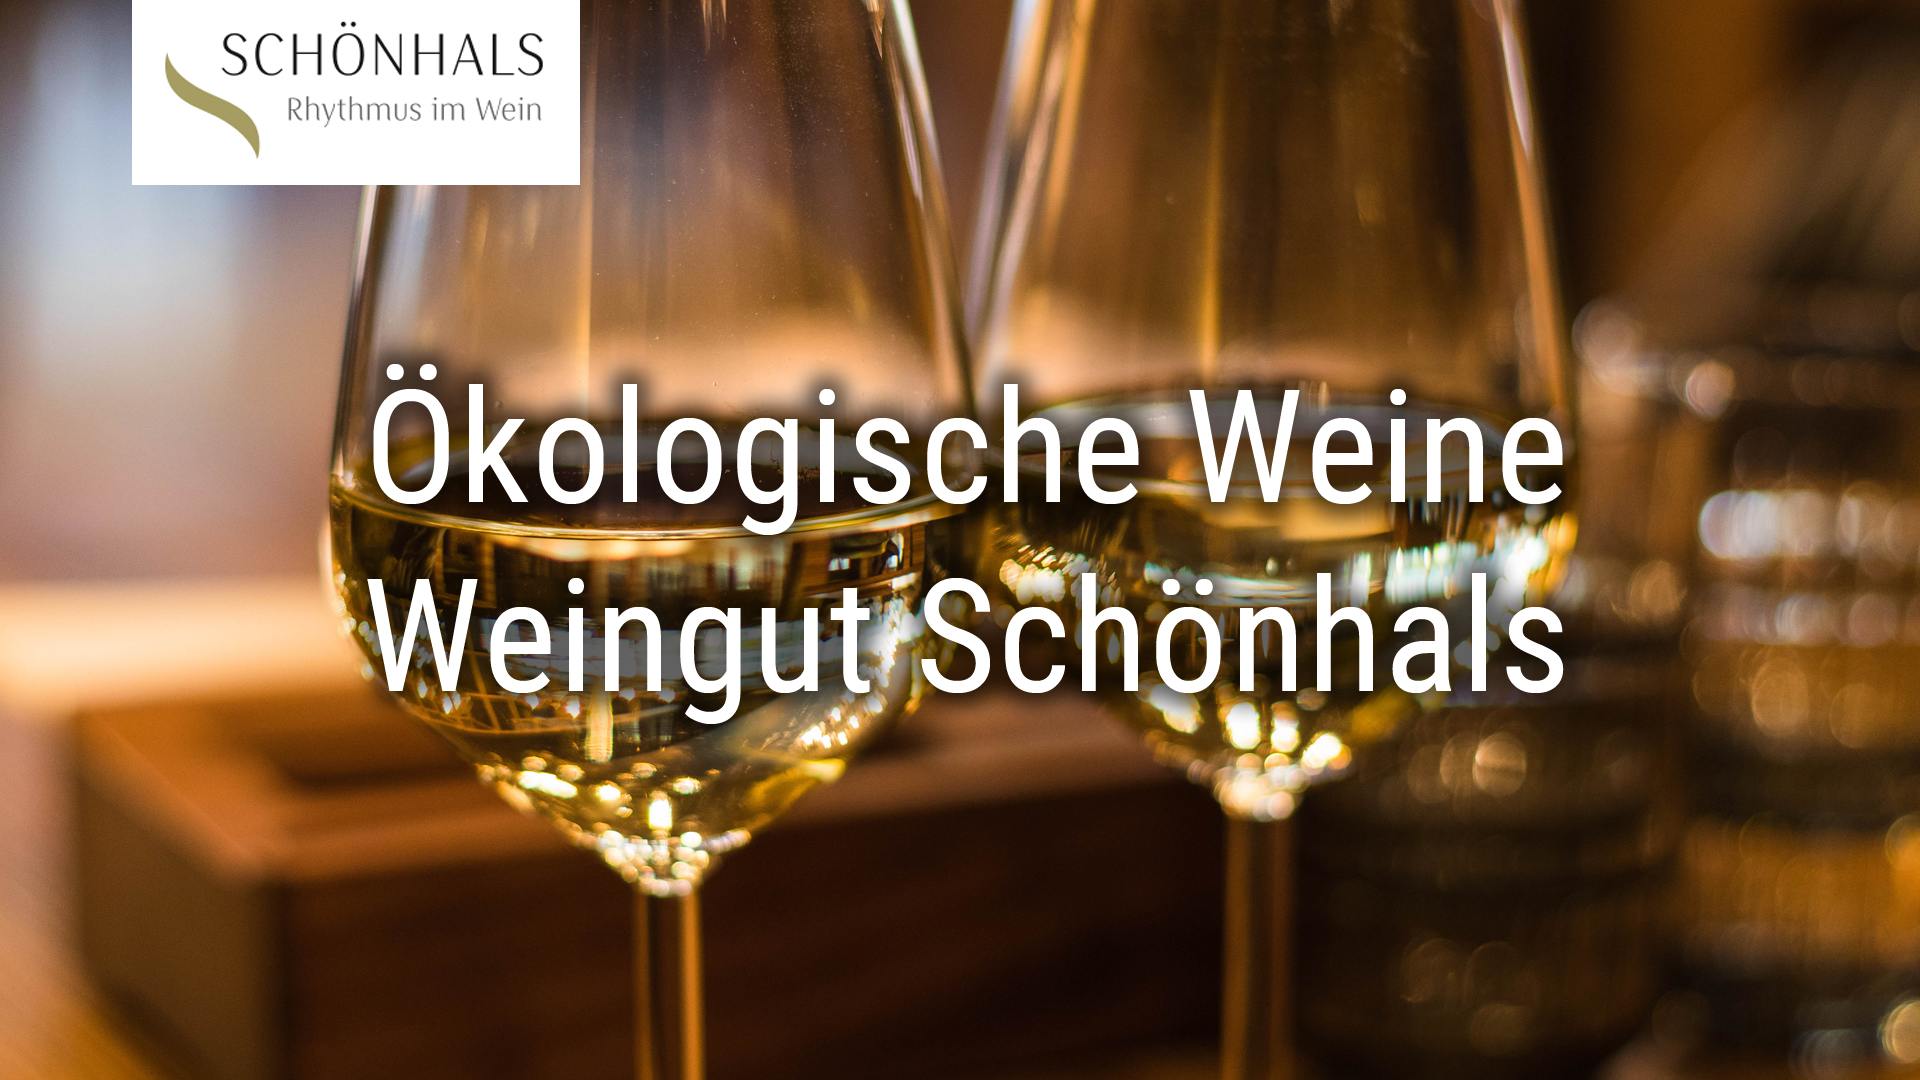 Organic wines from the Schönhals winery (ECOVIN)